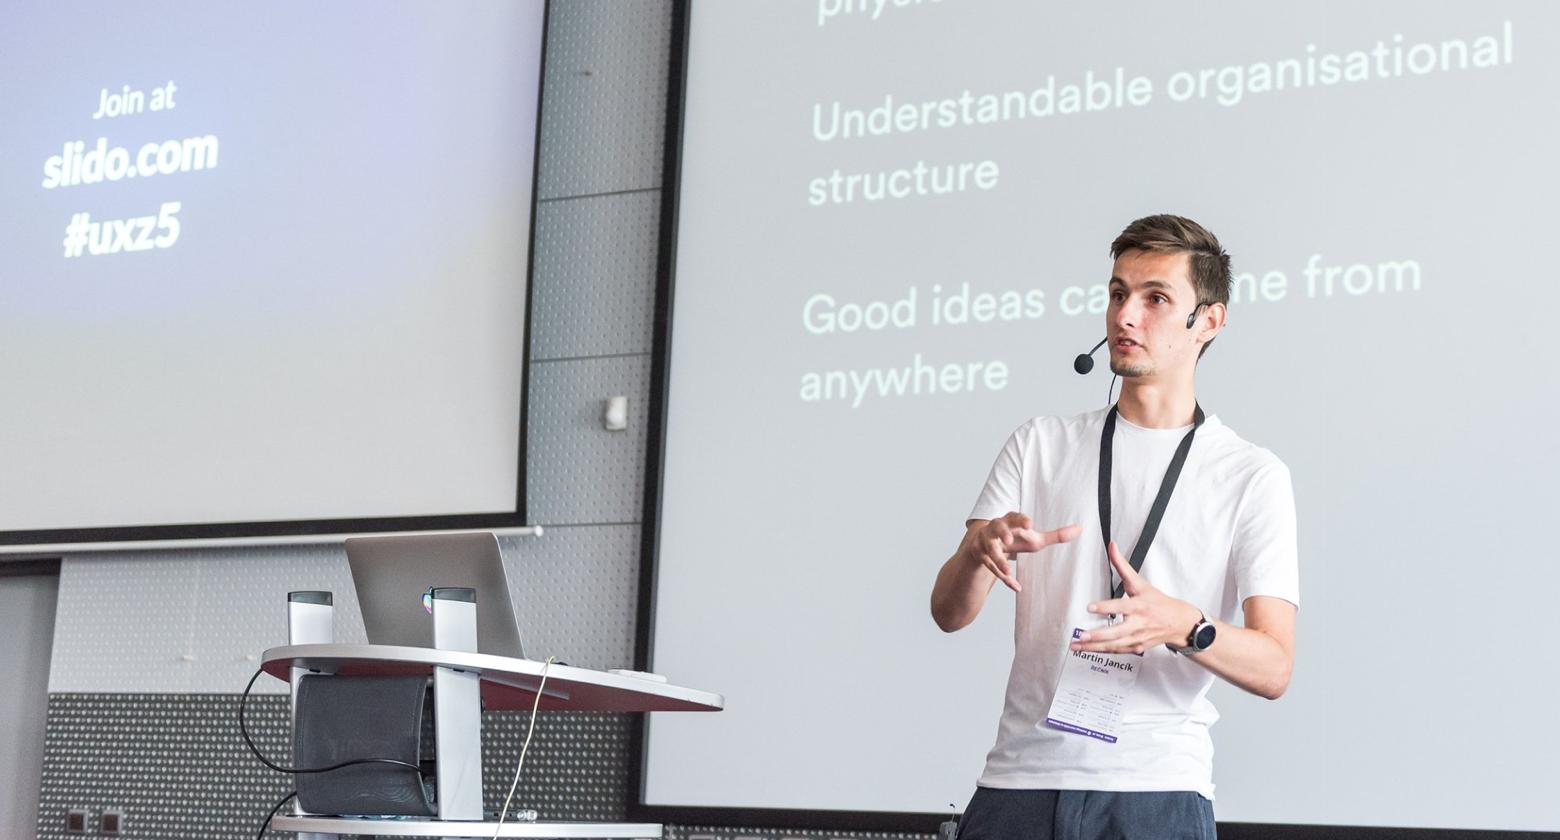 MJ presenting at UXZ conference in Prague